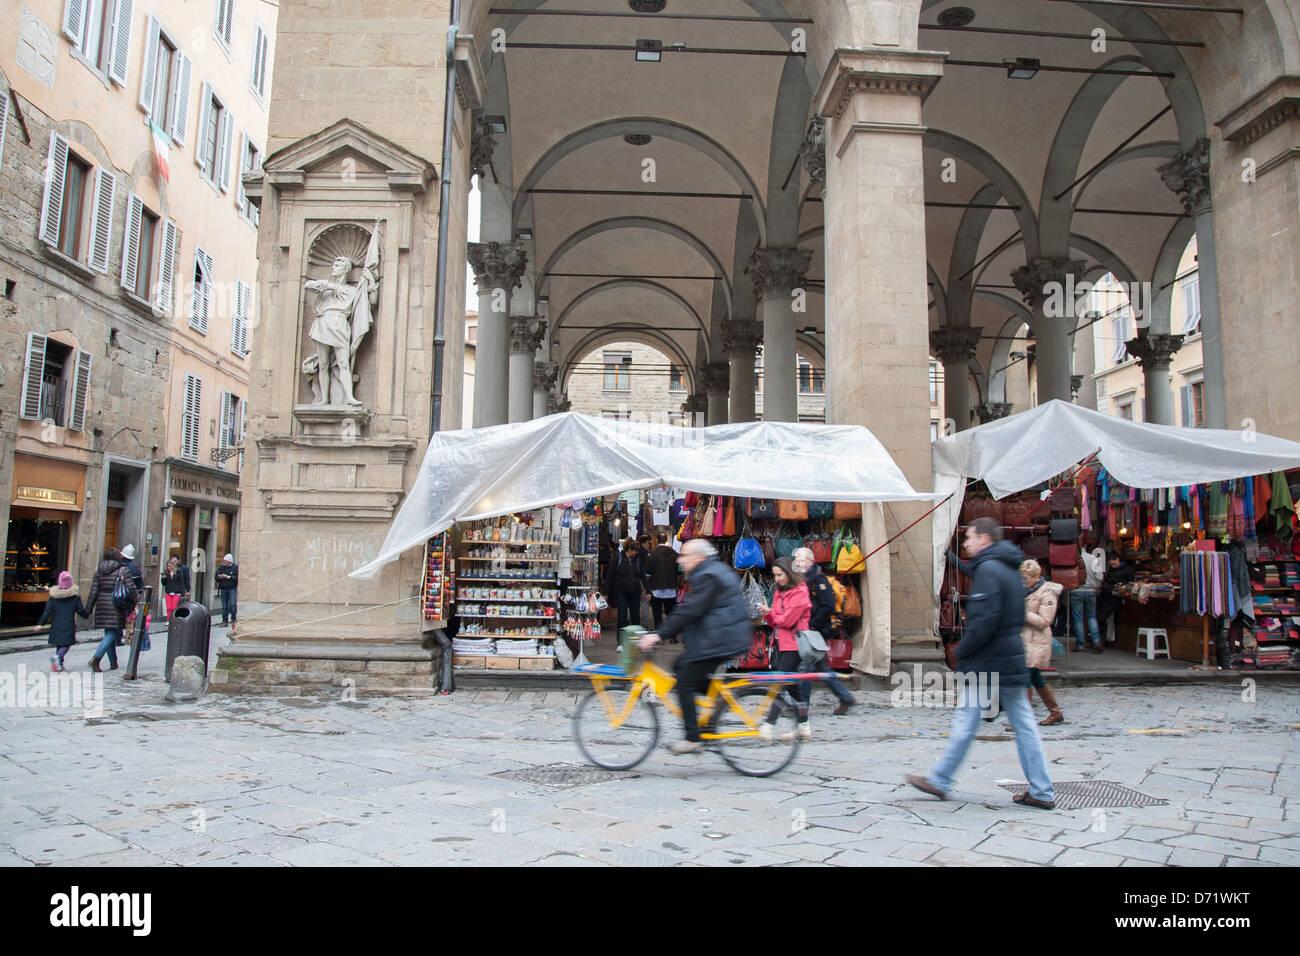 Mercato Nuovo - New Market, Florence; Italy - Stock Image